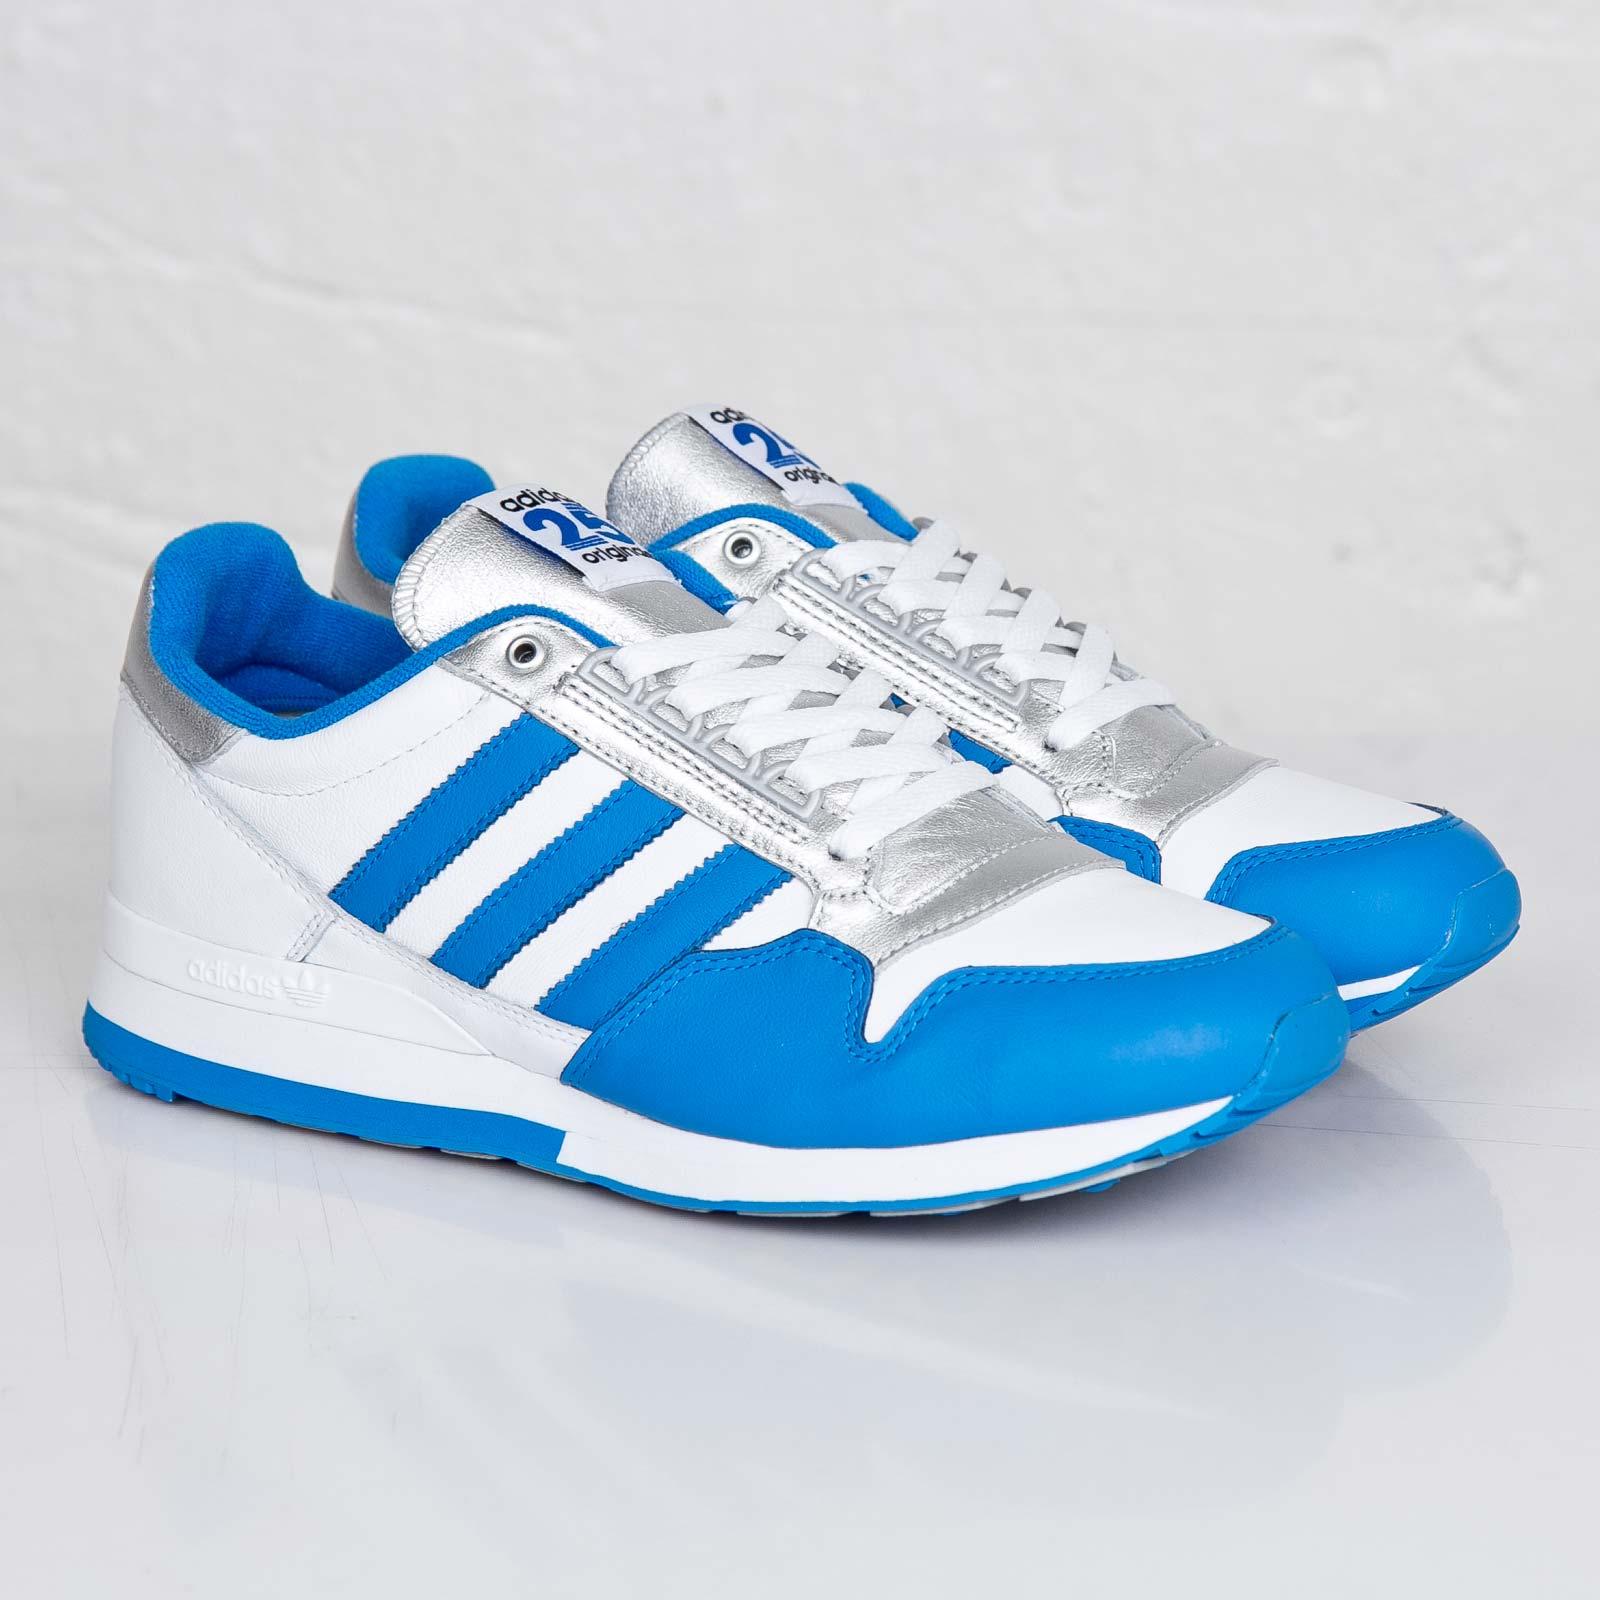 6dfa096df adidas ZX 500 OG Nigo - M21520 - Sneakersnstuff